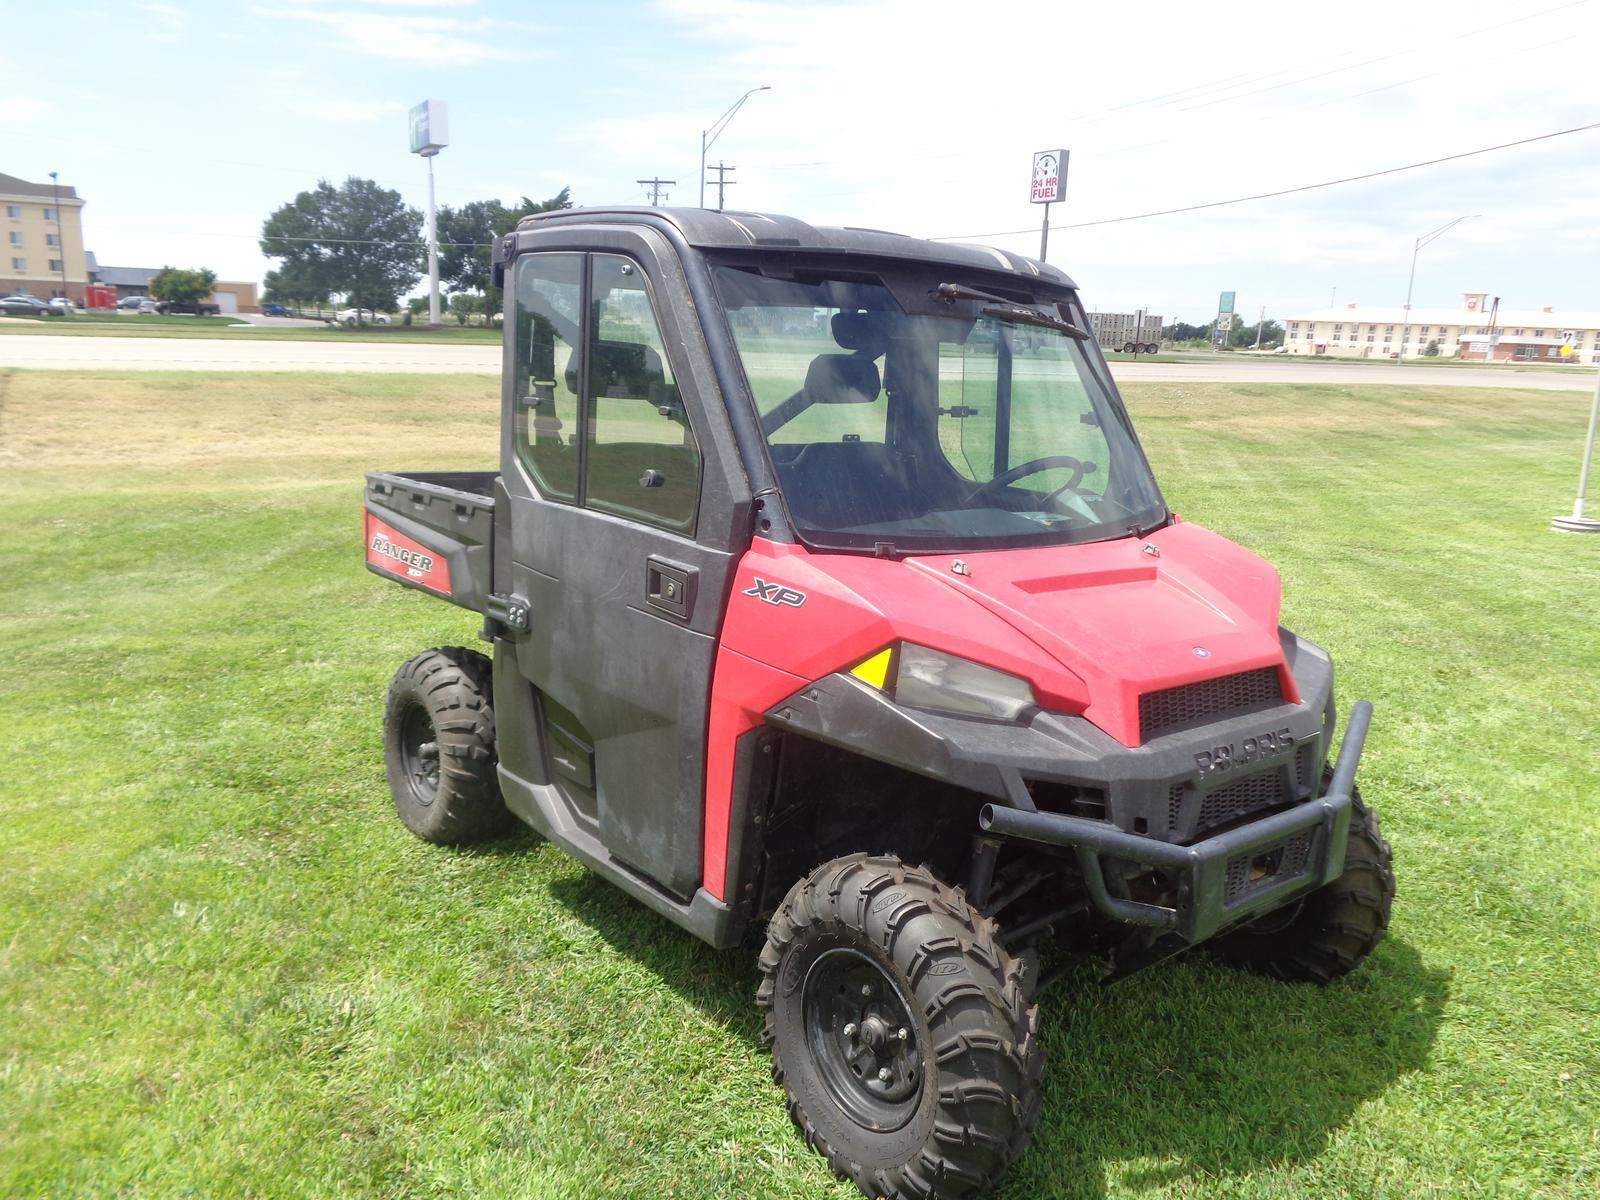 Inventory From Polaris Industries Kearney Powersports Ne 2004 Sportsman 700 Fuel Filter 2015